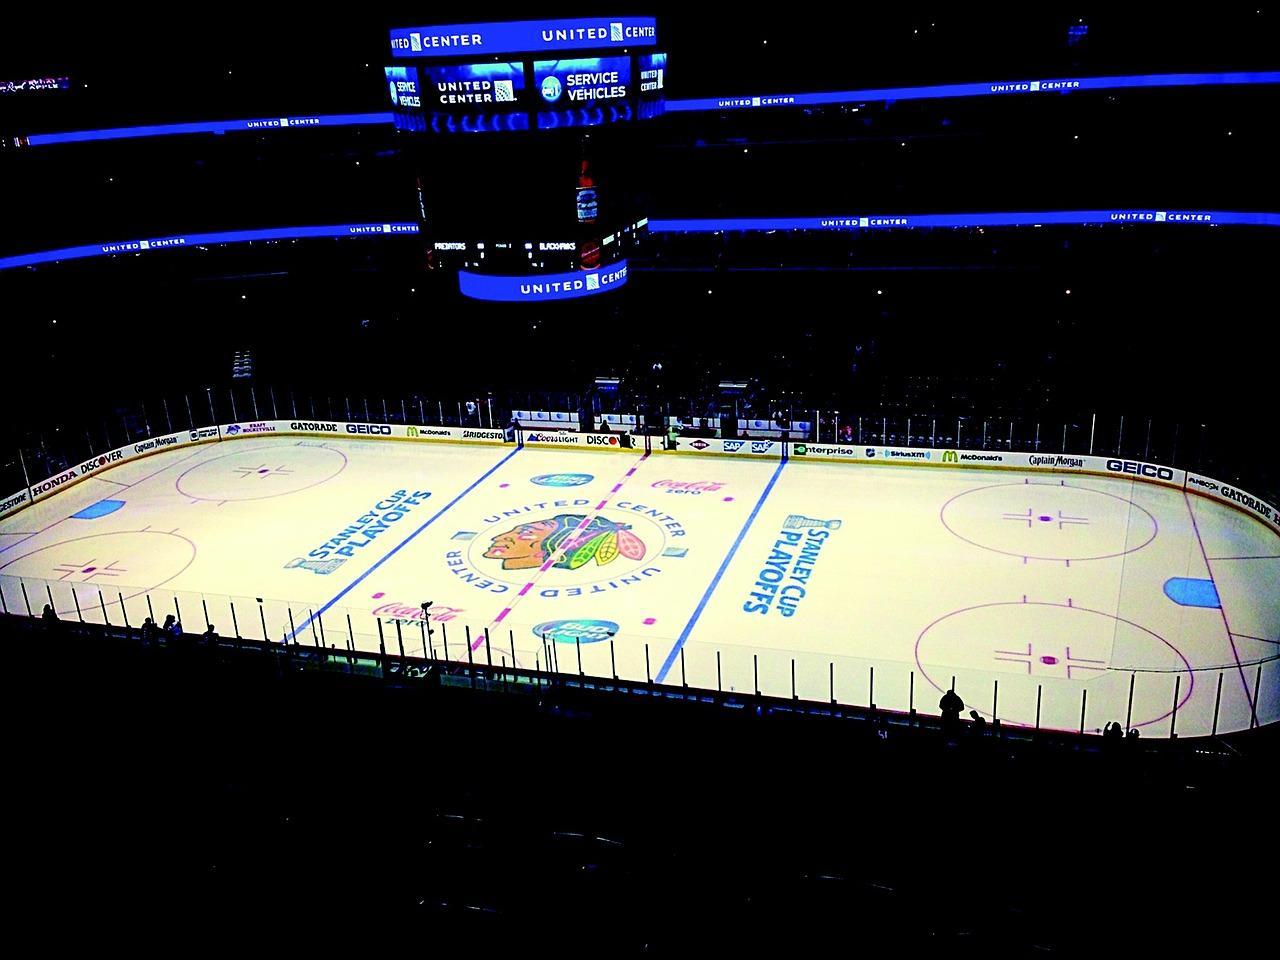 The United Center.